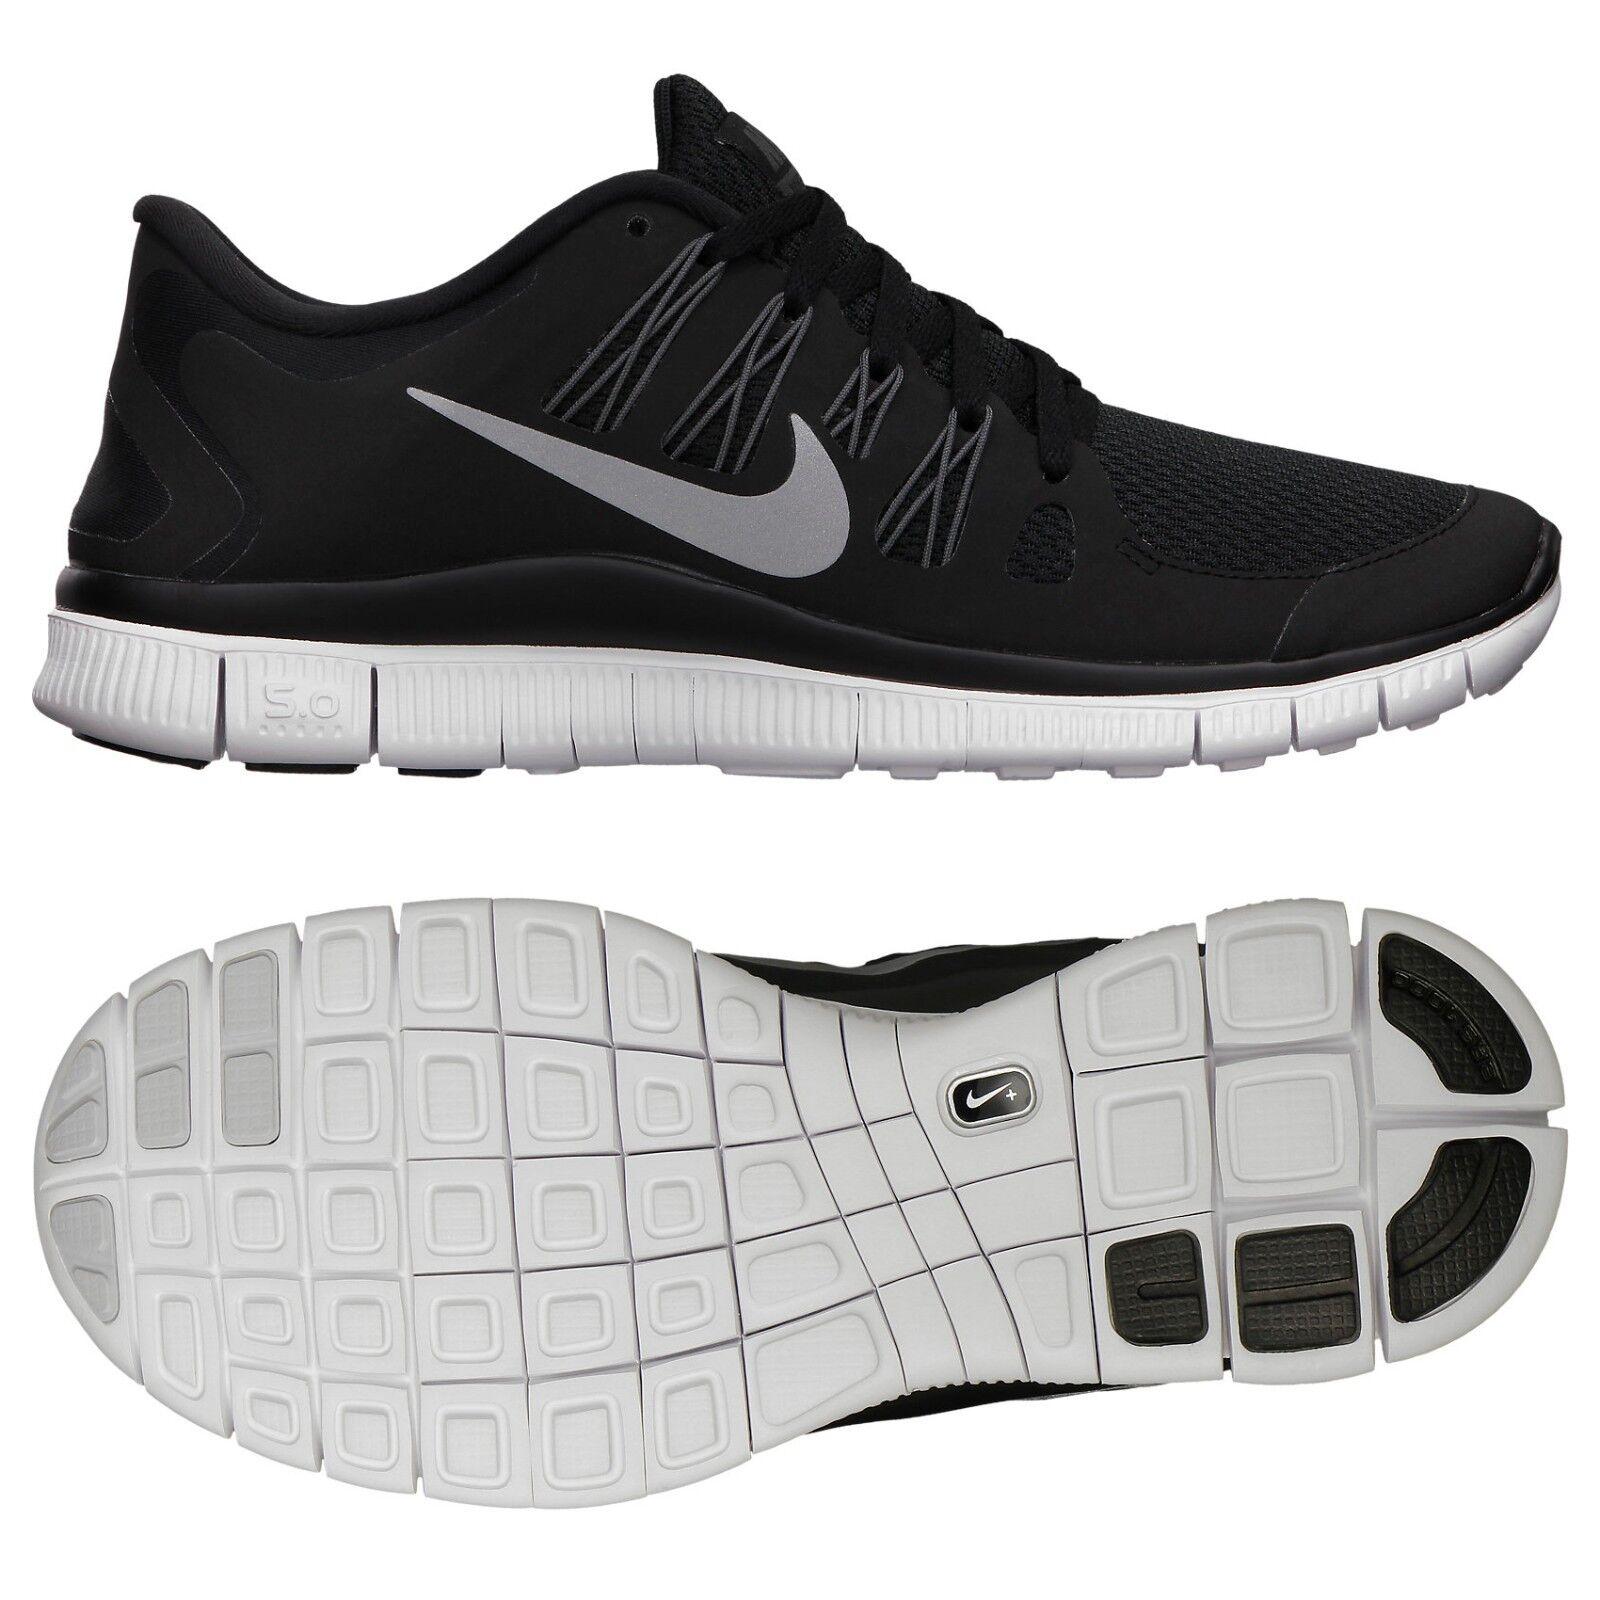 Nike Wmns Free 5.0+ 580591-002 Black Silver Dark Grey White Women Running shoes